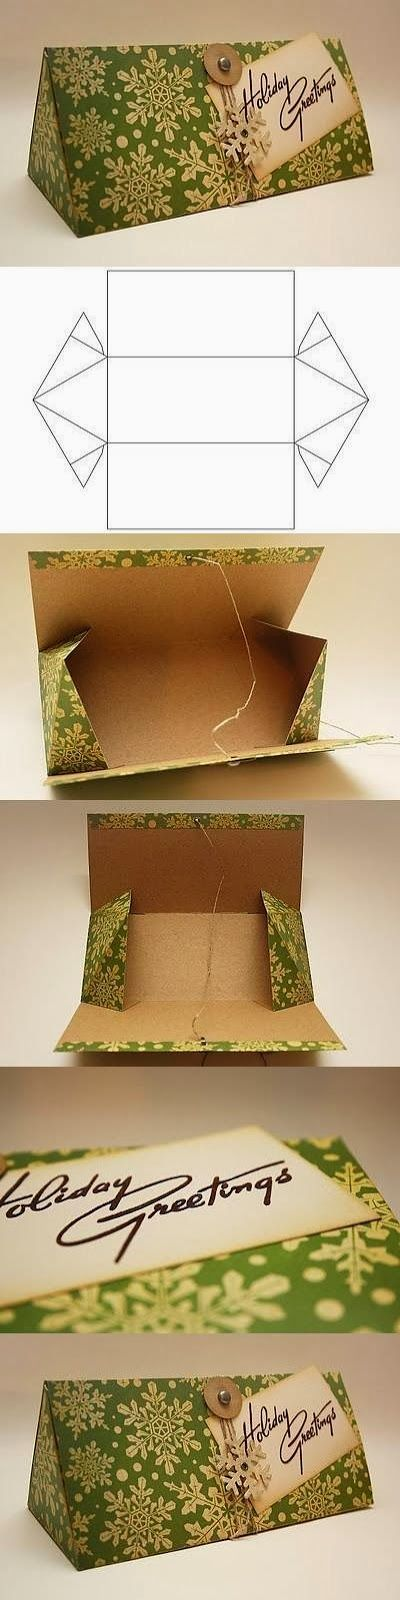 DIY : Long Gift Box | DIY & Crafts Tutorials